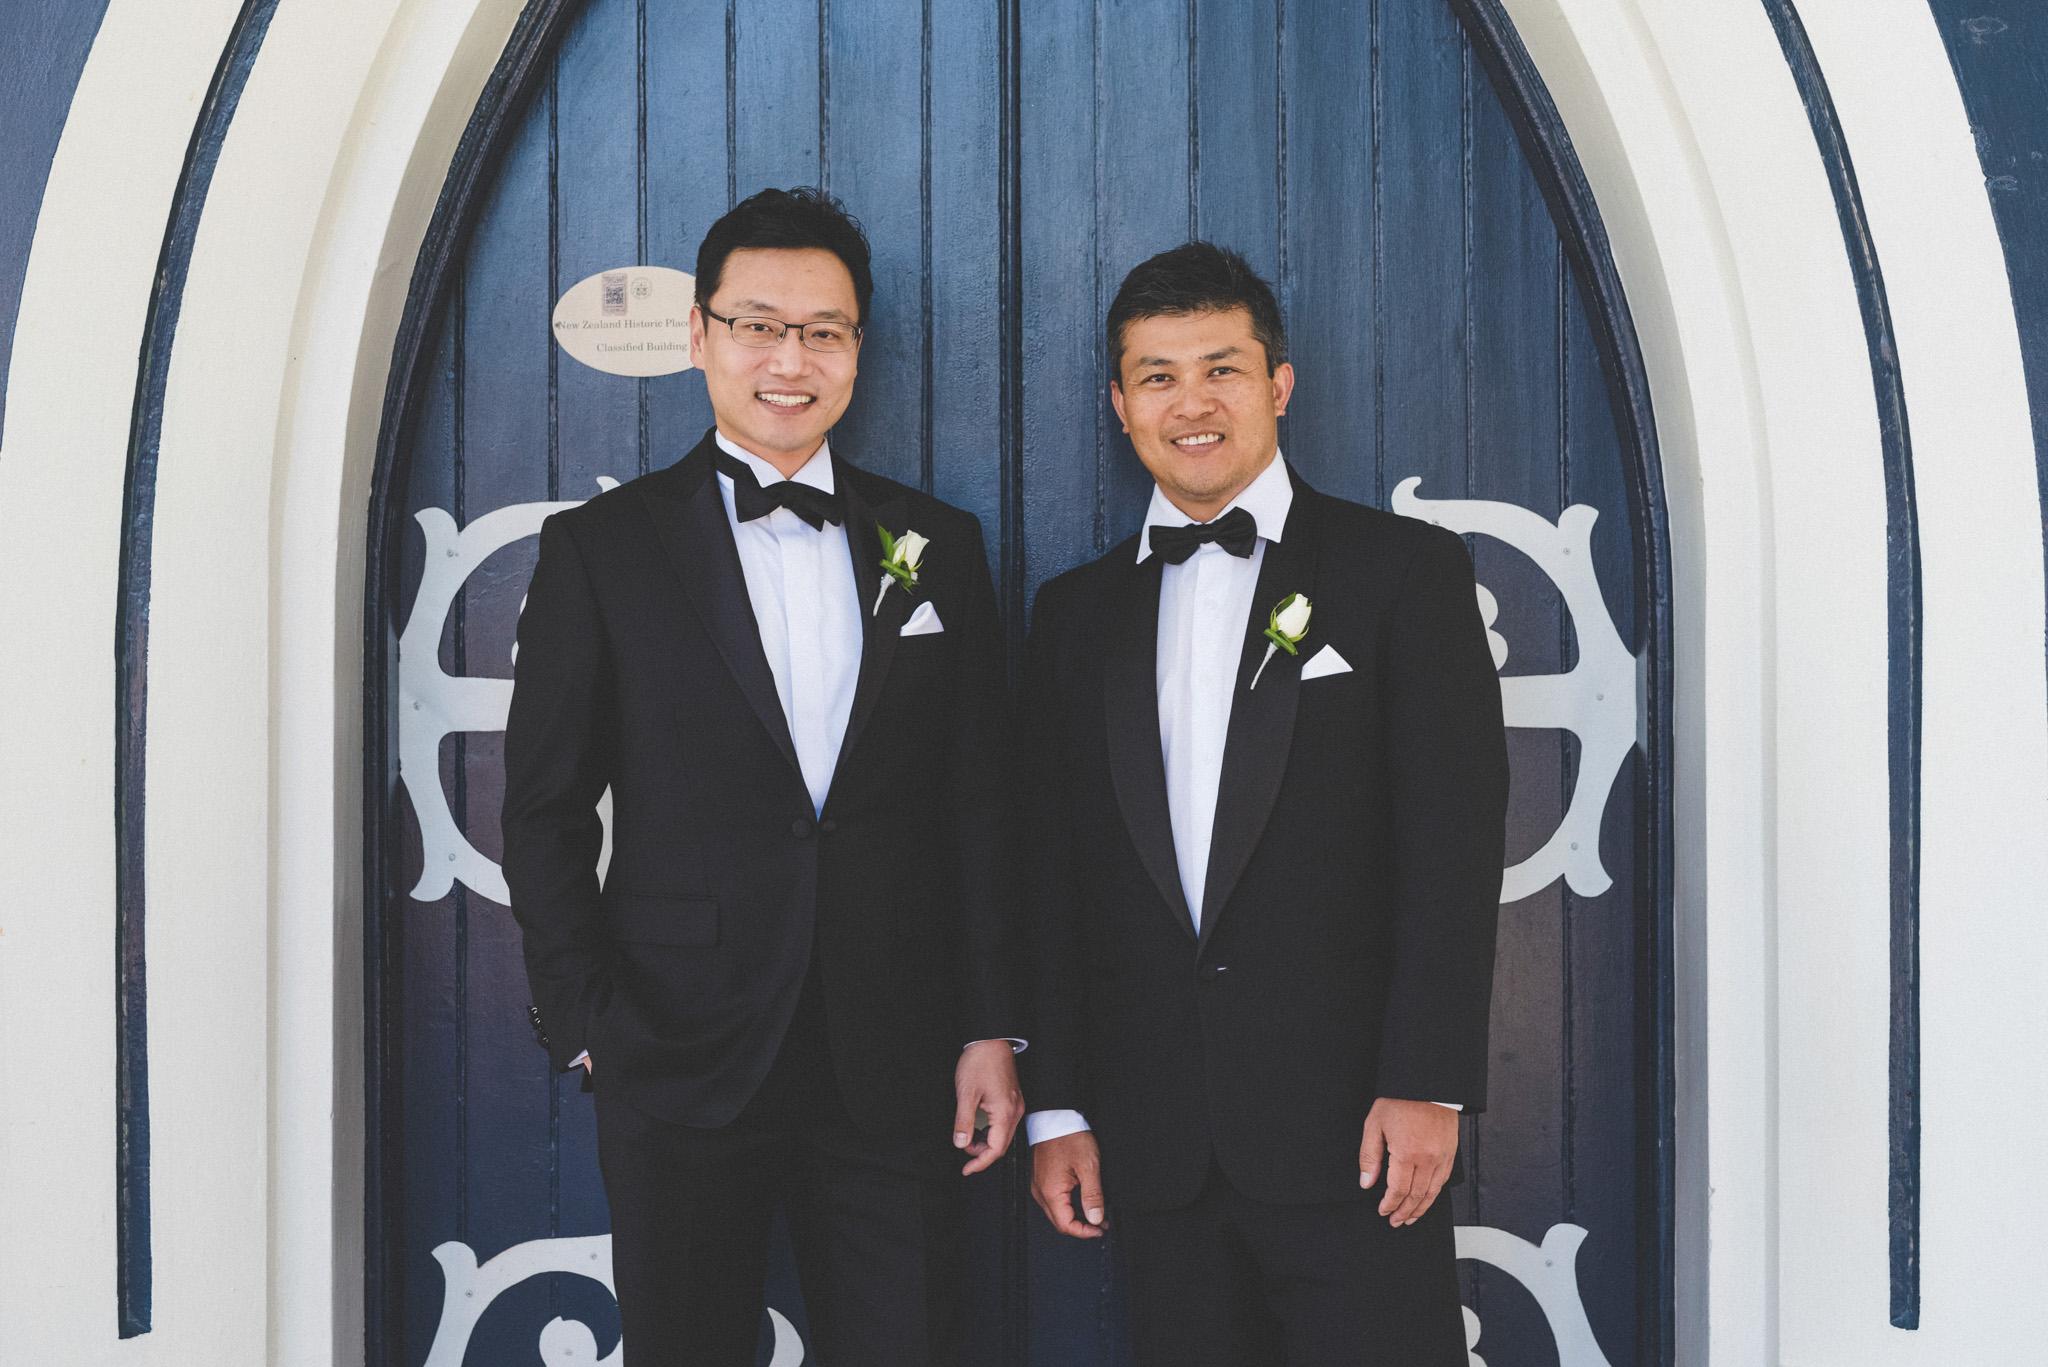 st johns wedding ceremony